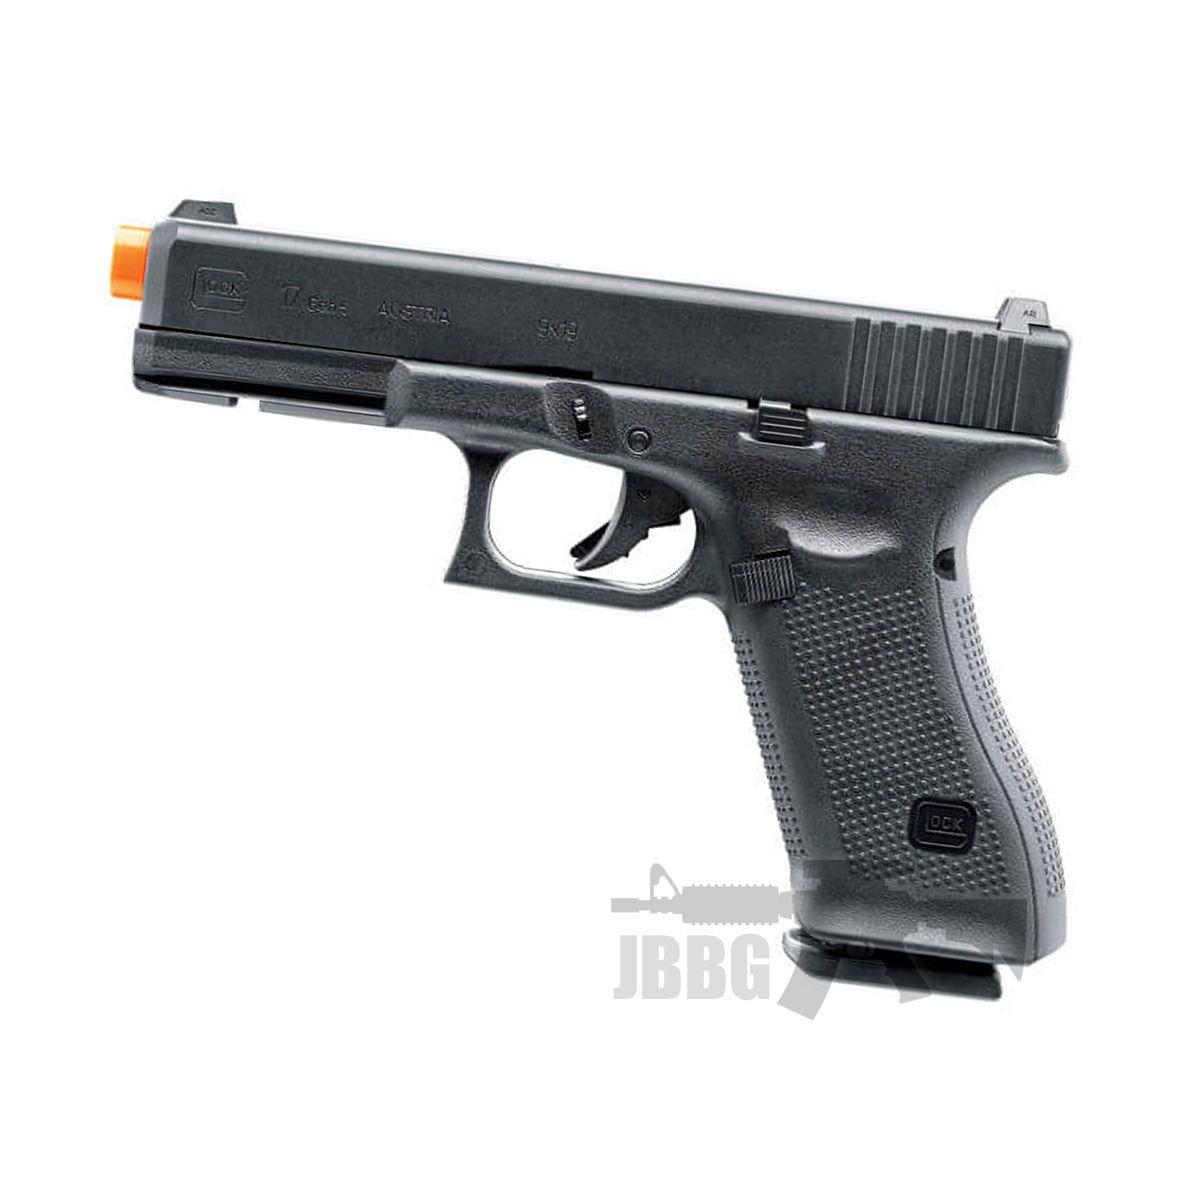 Glock G17 Gen5 Airsoft Gas Pistols with Blowback